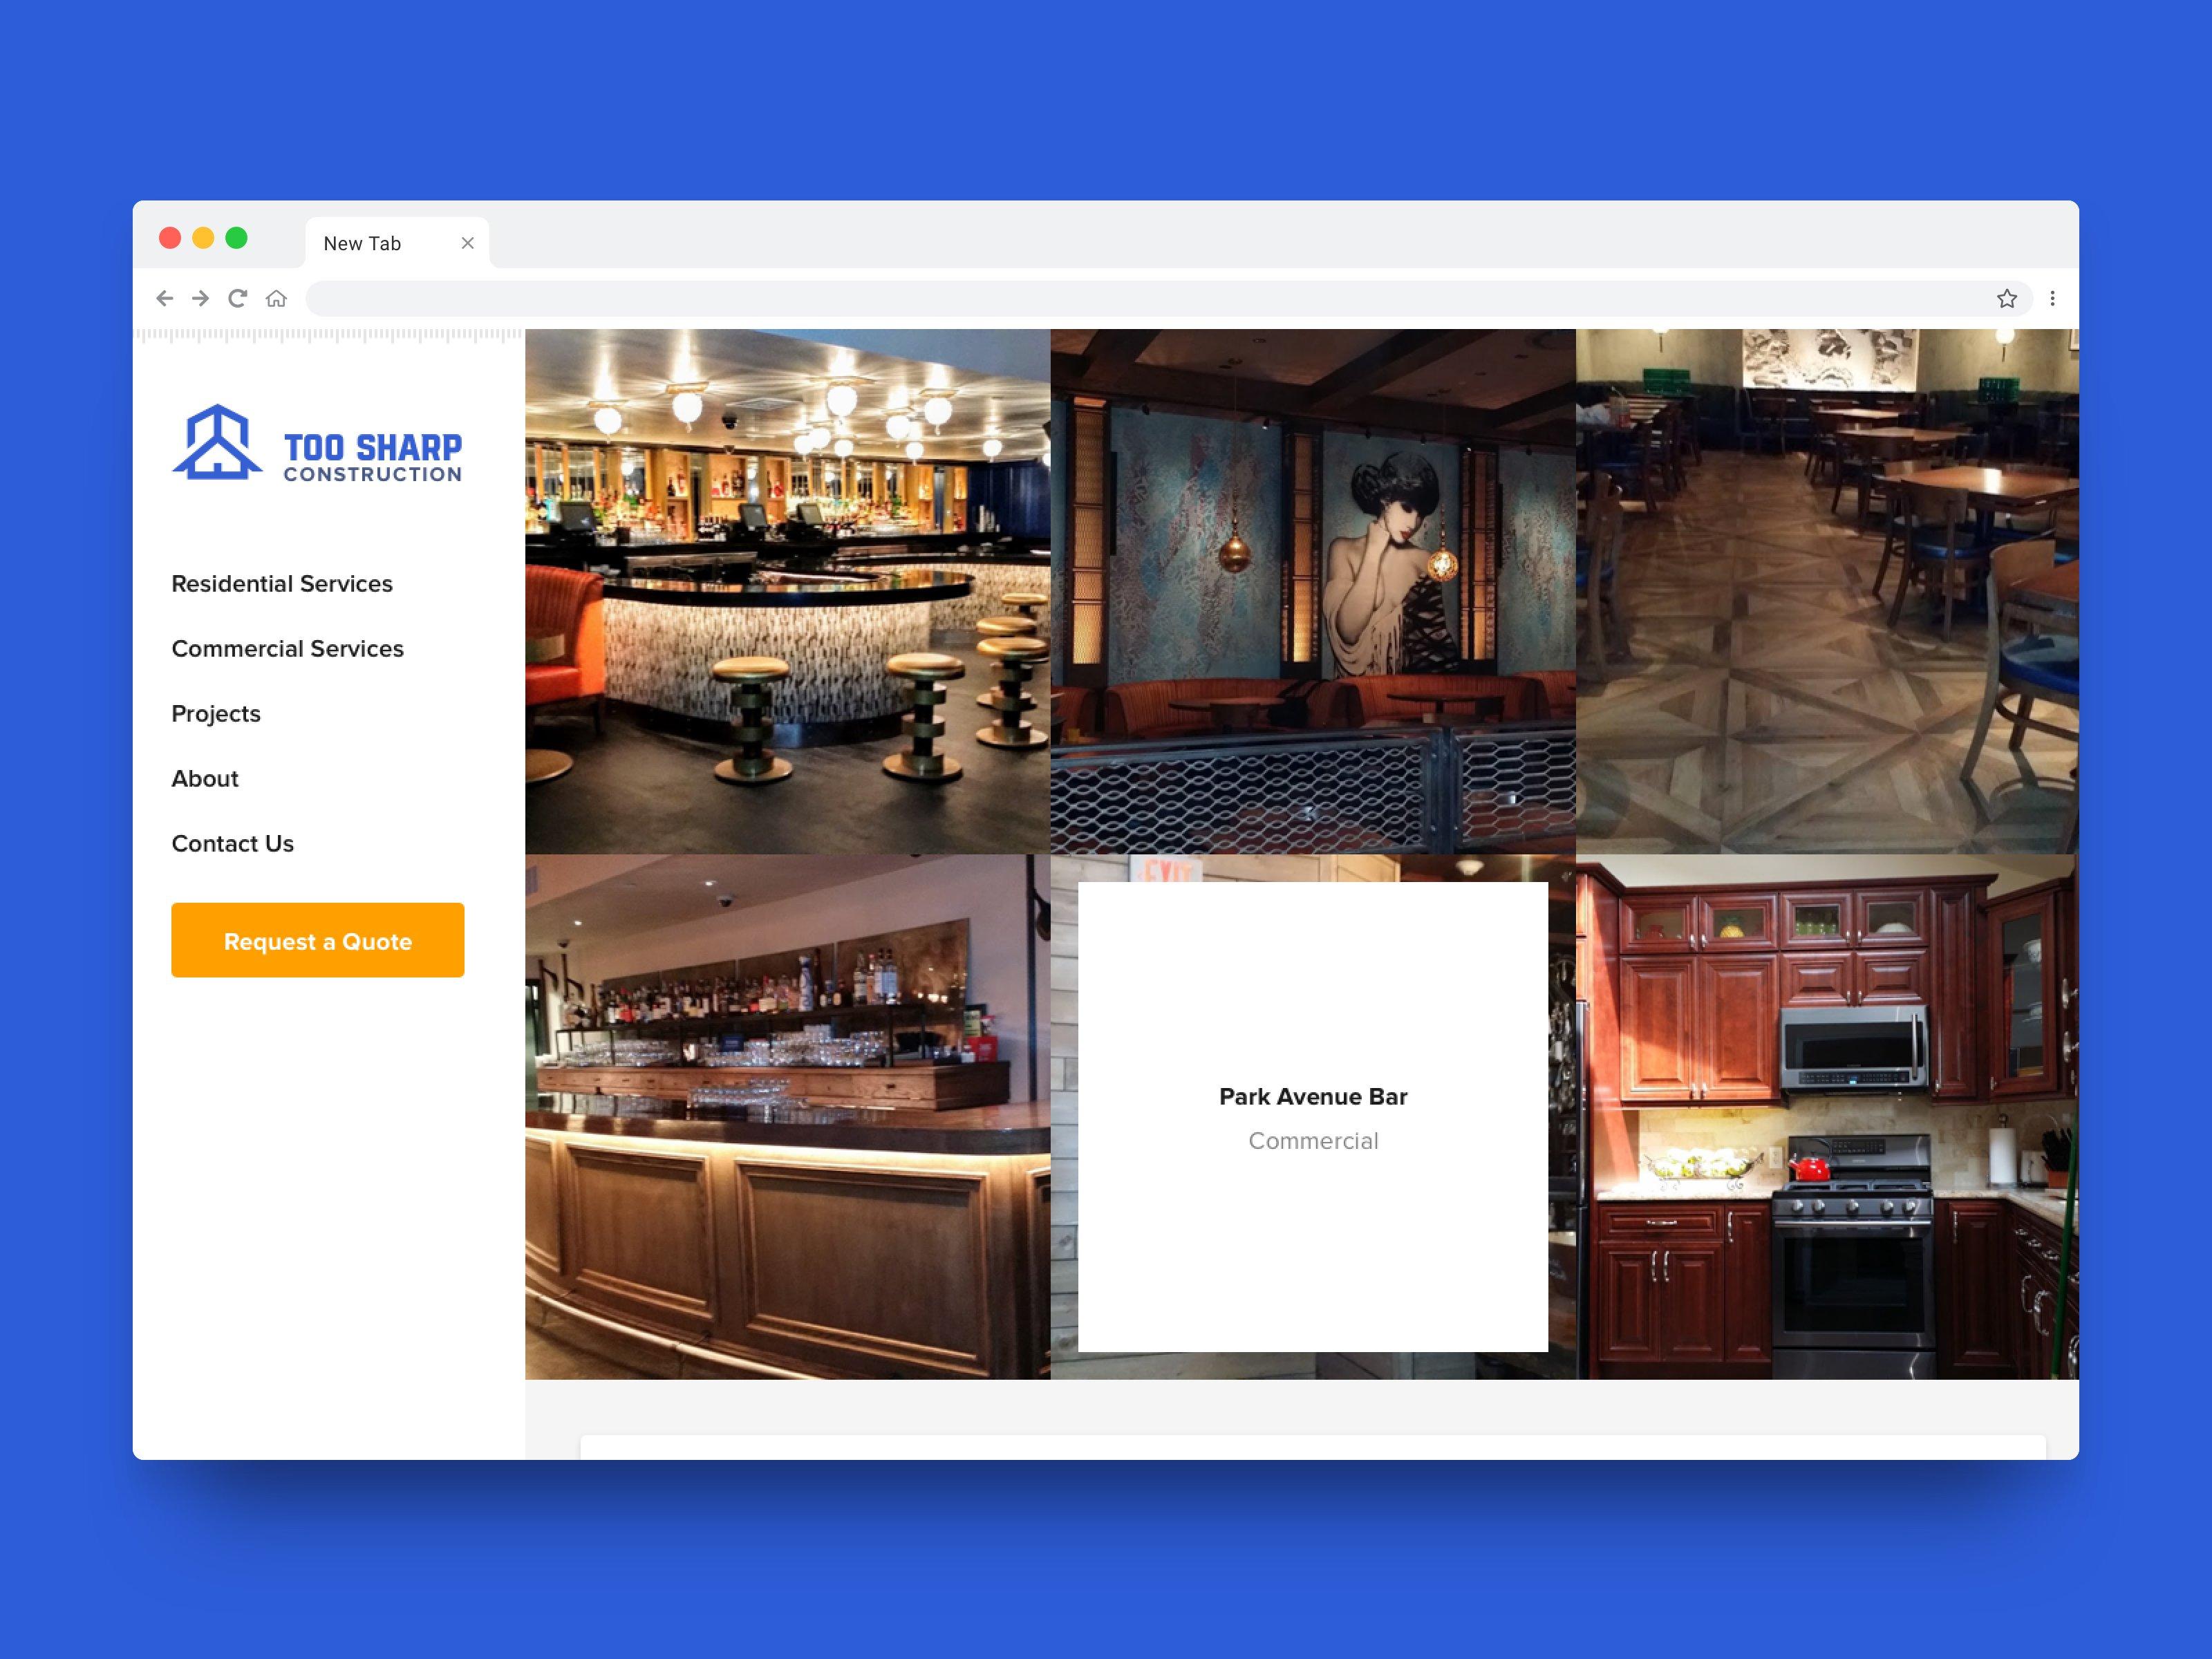 Screenshot of Too Sharp Construction Website